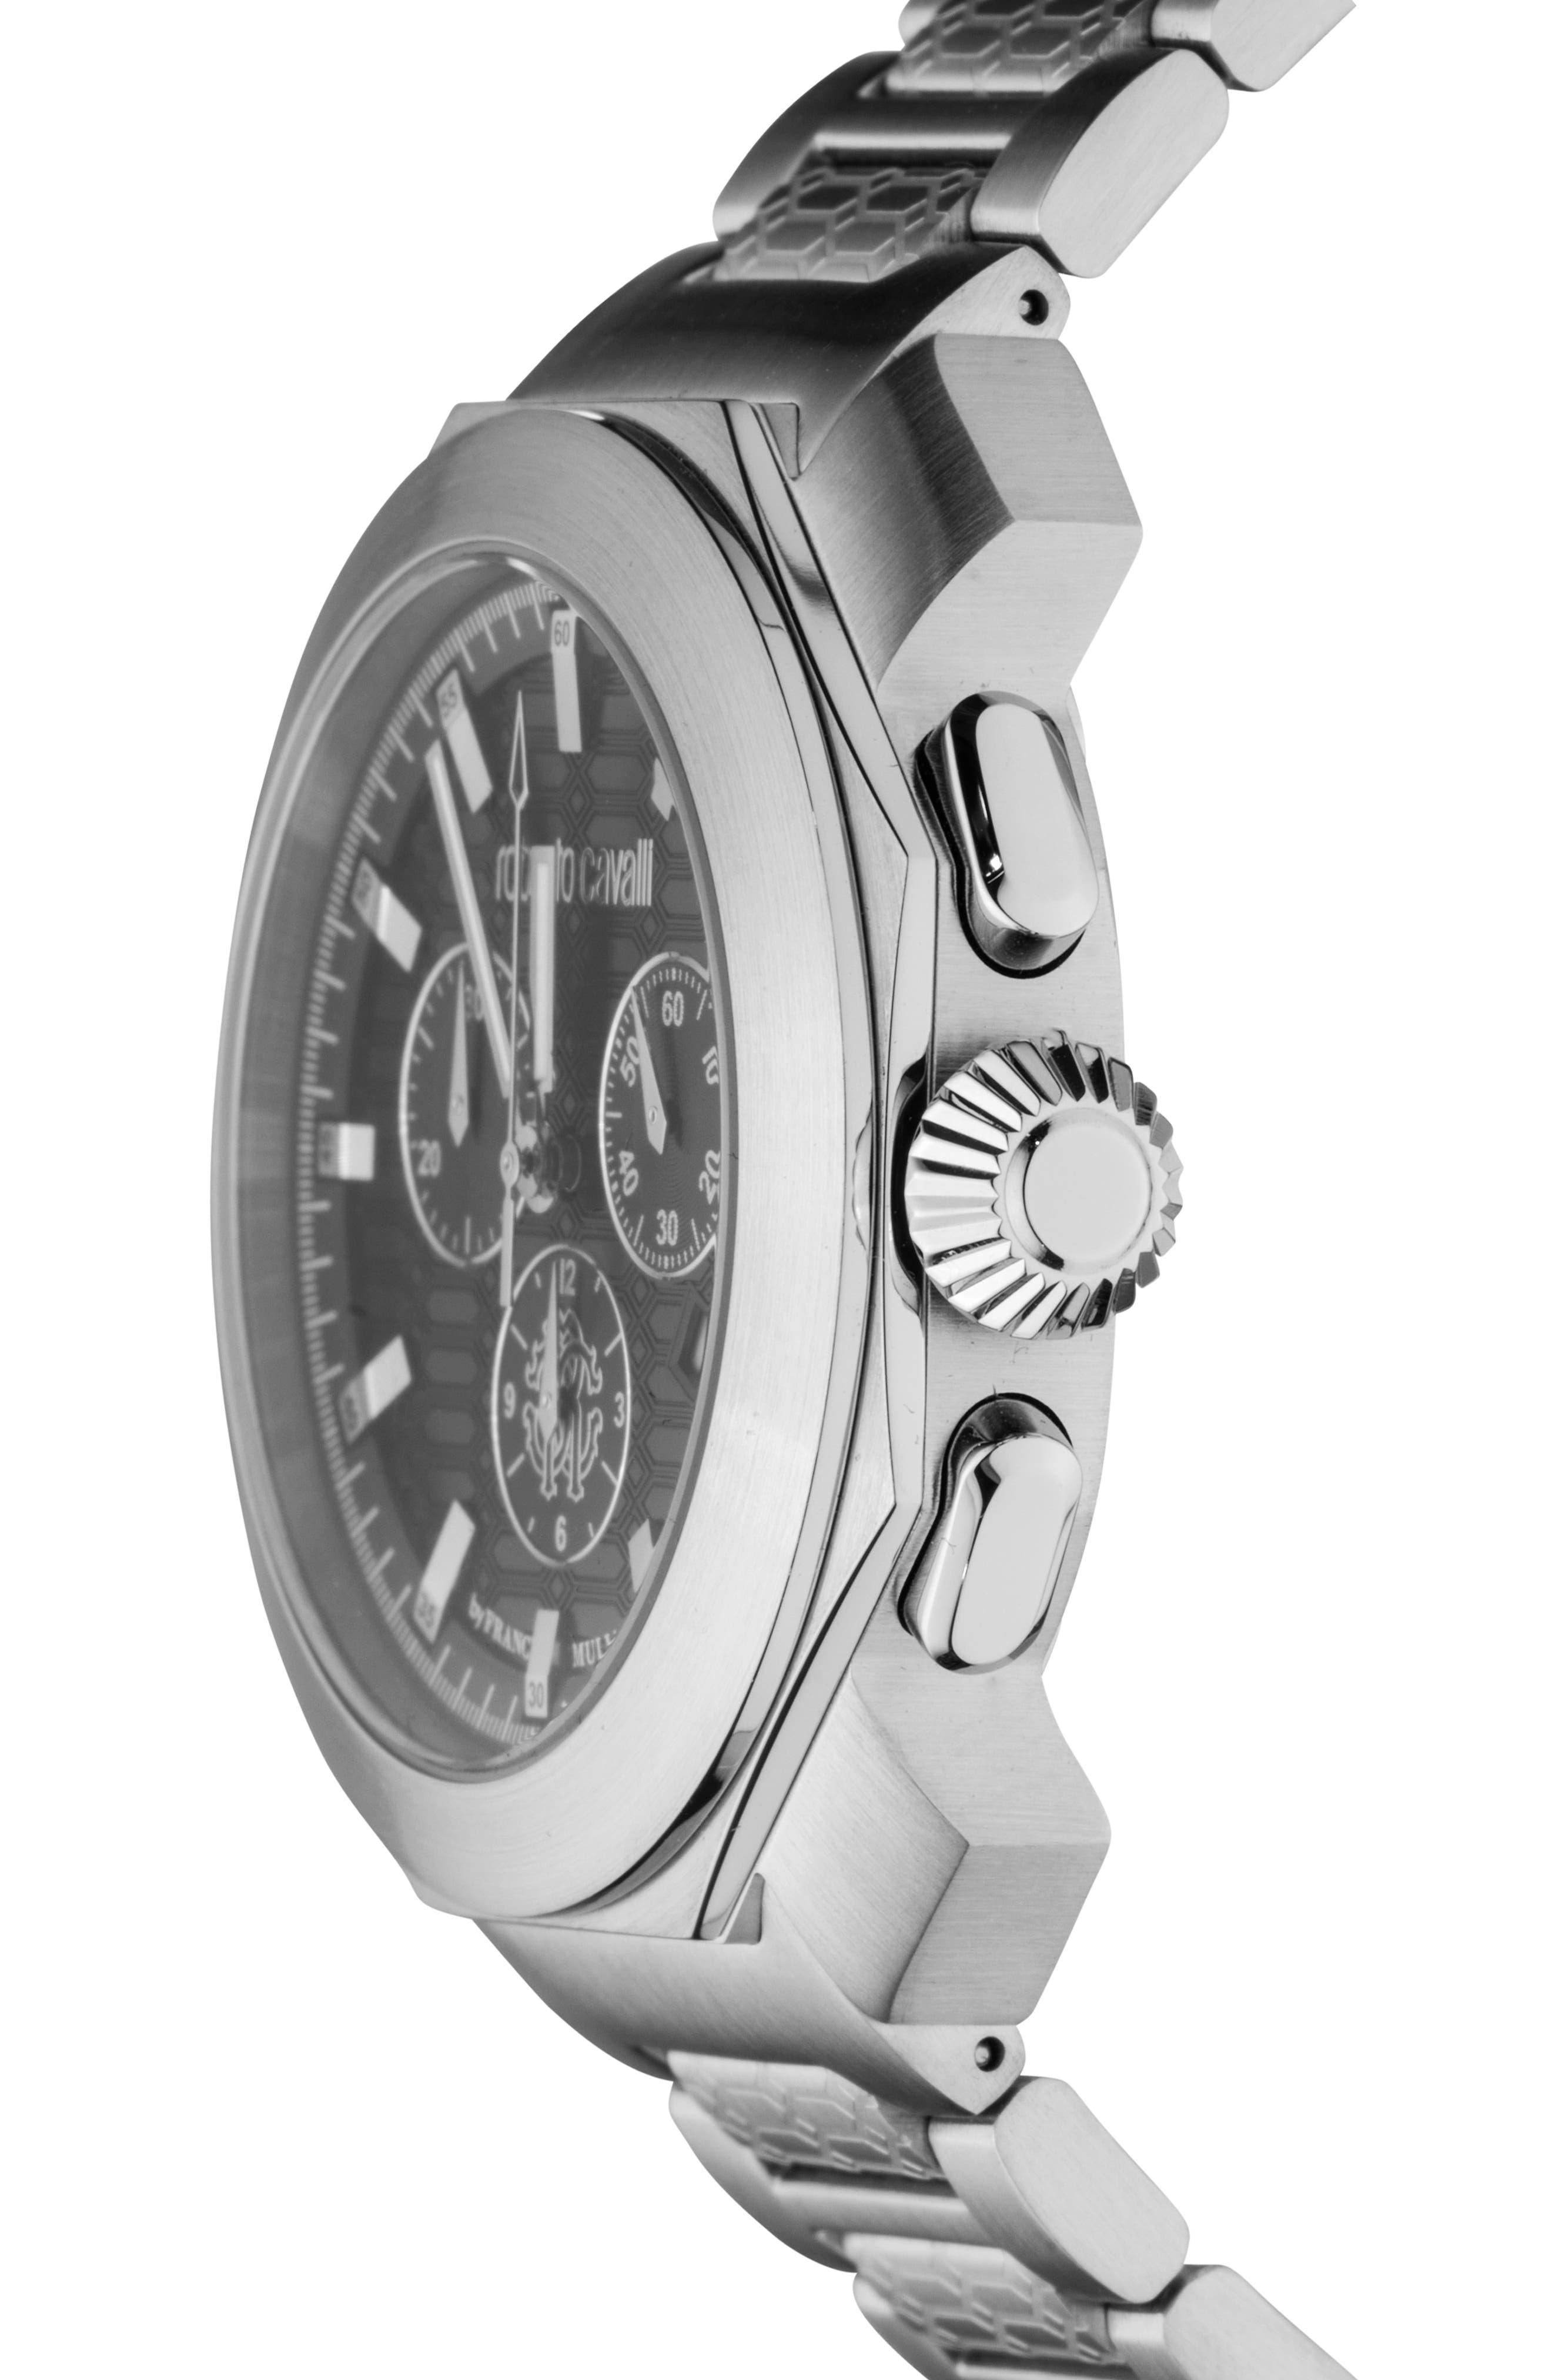 Sport Classic Chronograph Bracelet Watch,                             Alternate thumbnail 2, color,                             SILVER/ BLACK